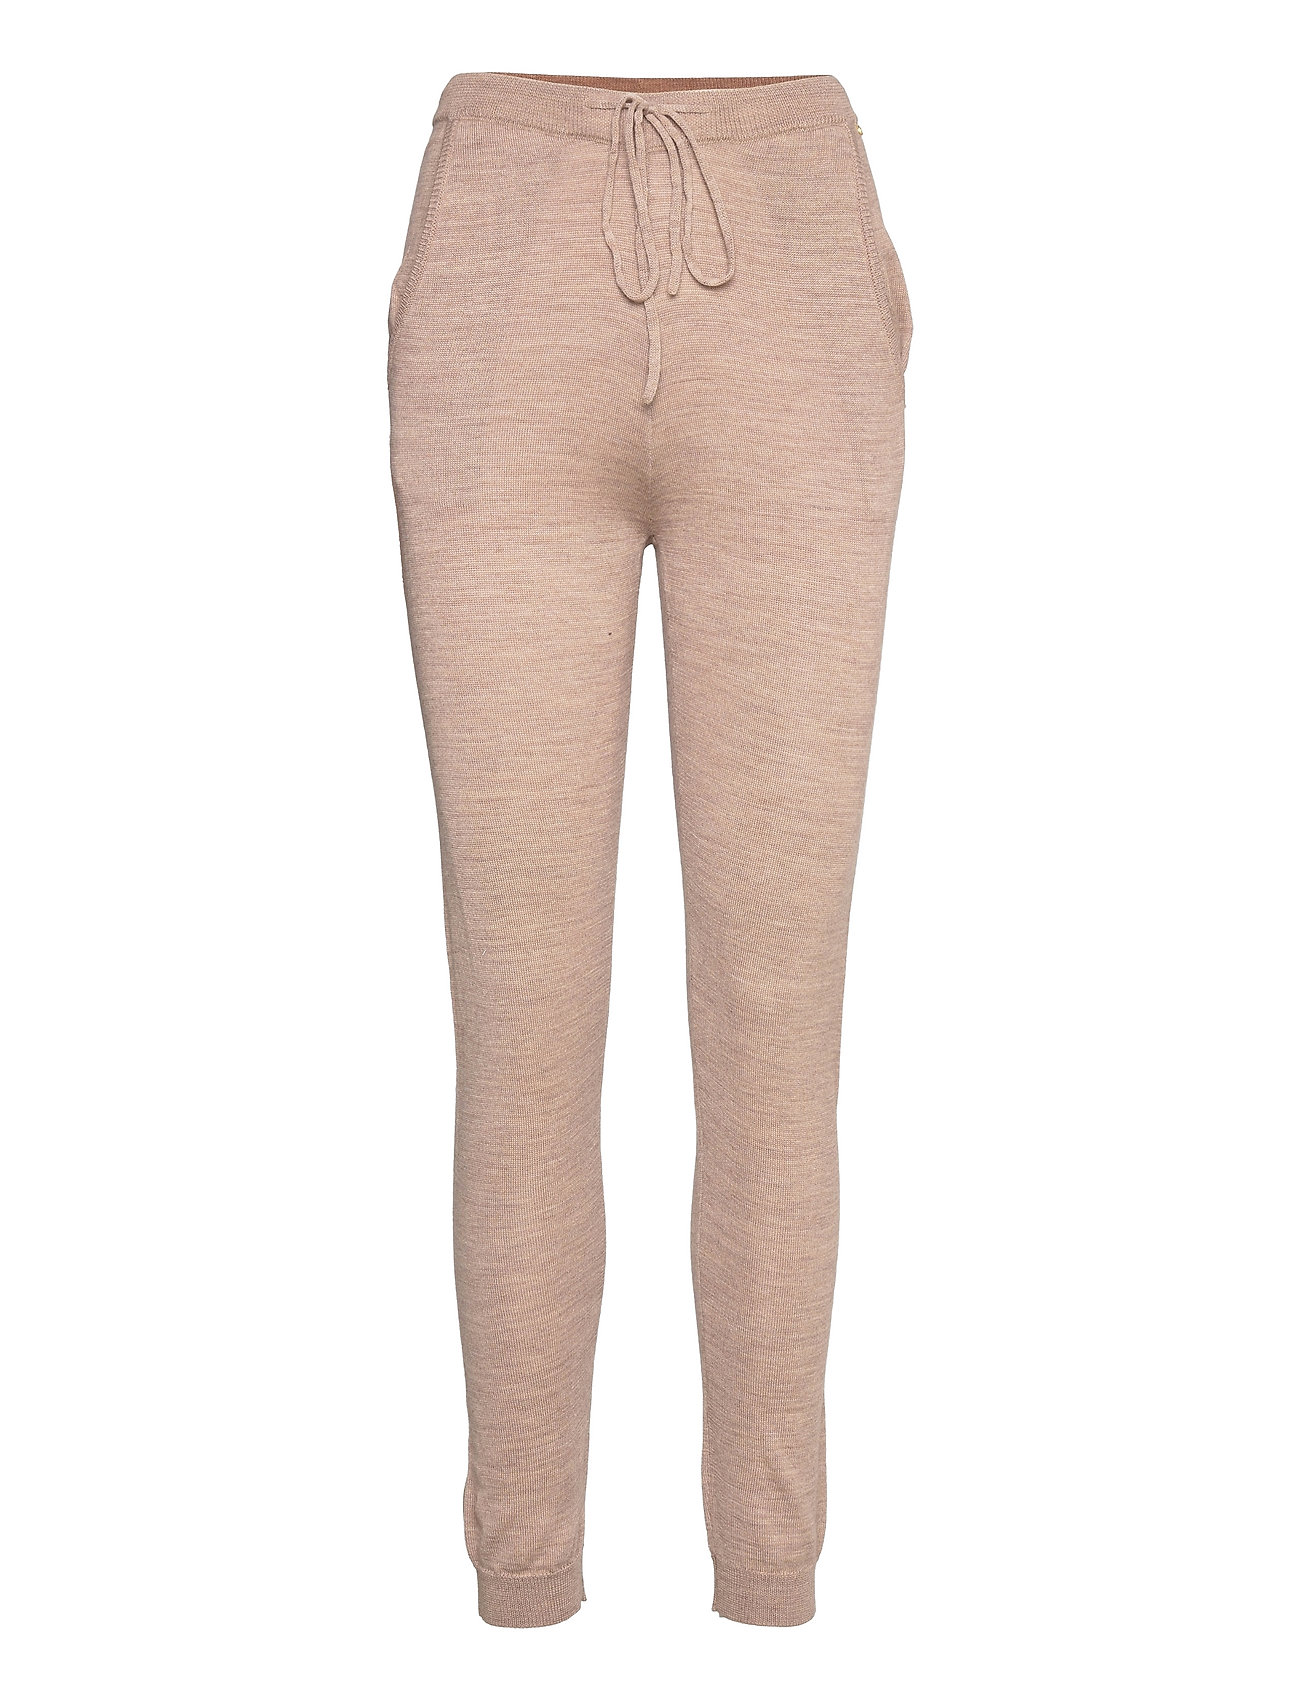 Merino Trousers Casual Bukser Beige Rosemunde